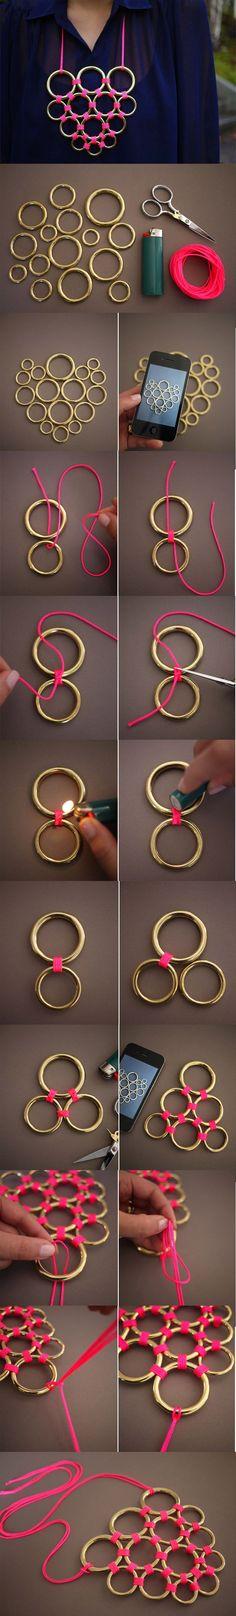 5 DIY - Necklace Ideas - Fashion Diva Design